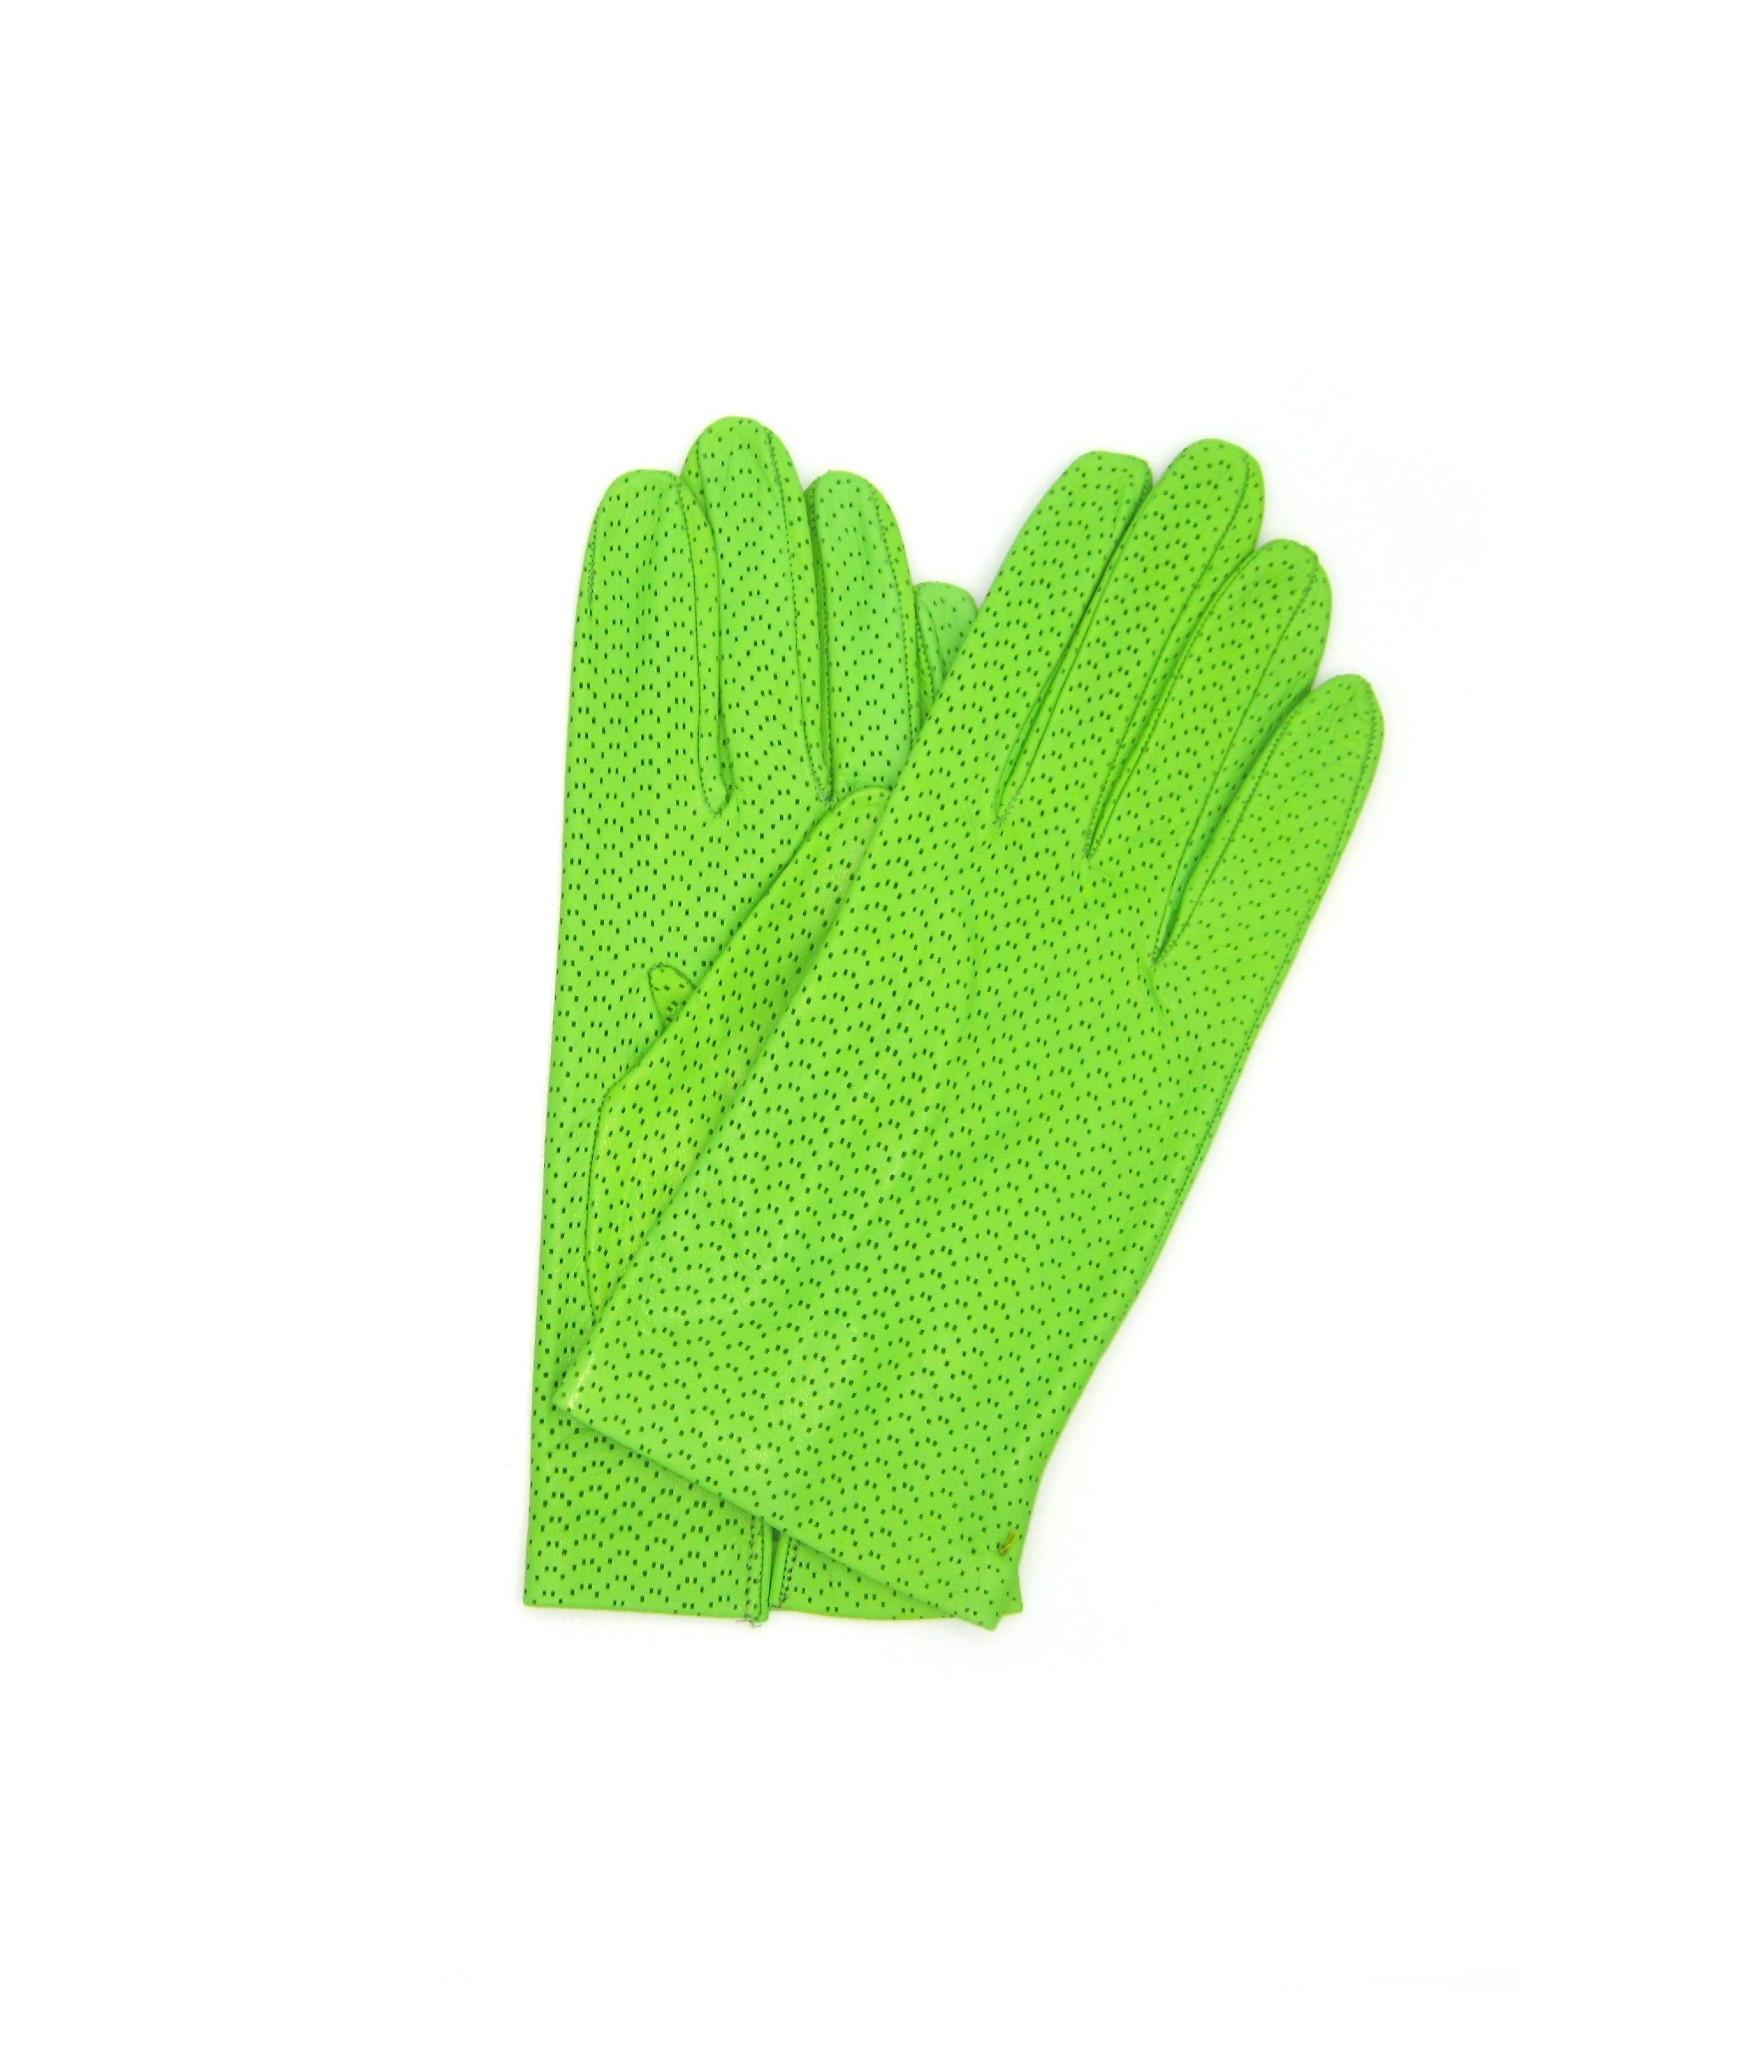 Nappa glove unlined Light Green Sermoneta Gloves Leather